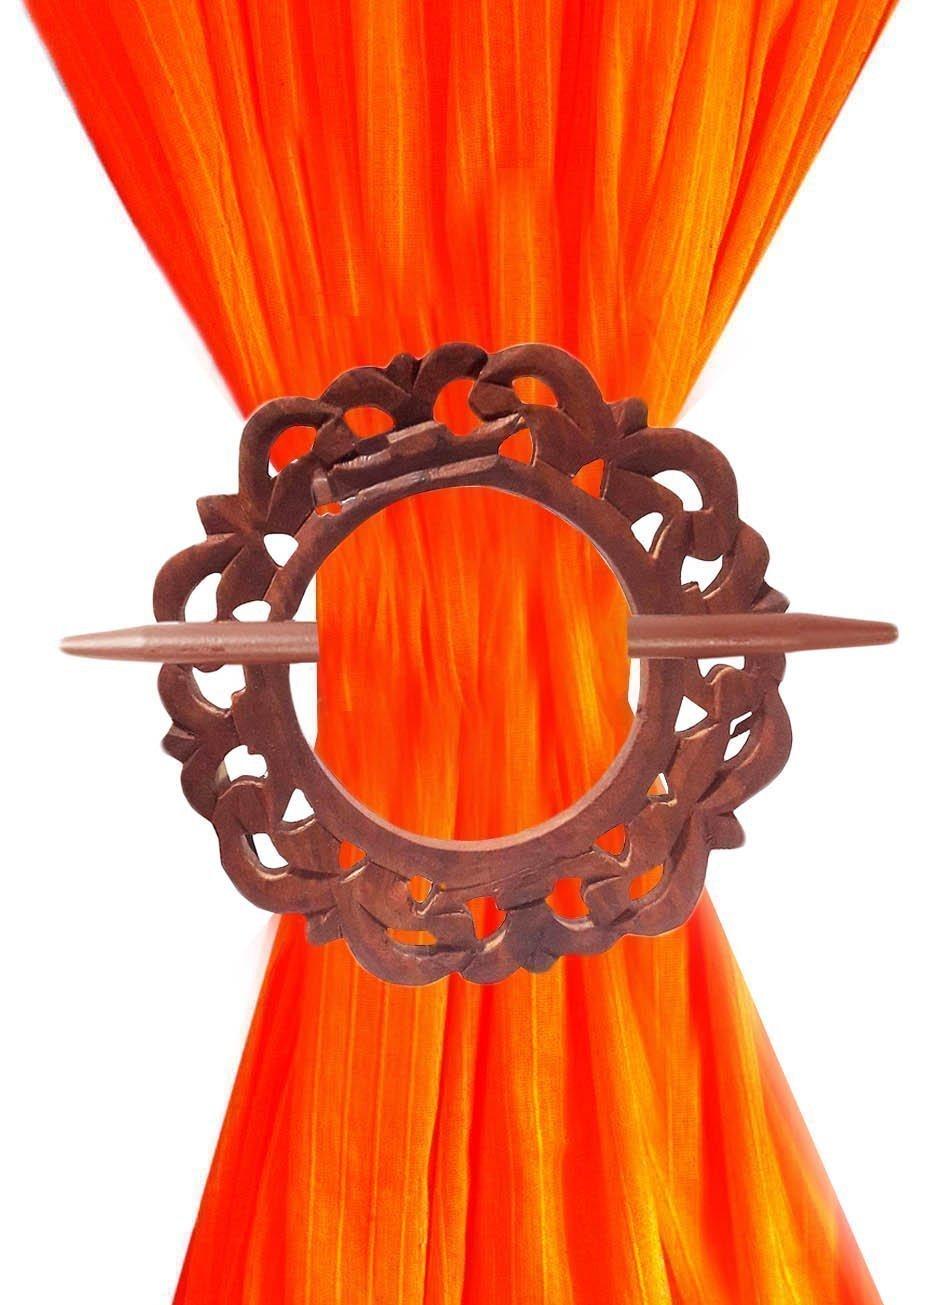 Wooden Curtain TieBacks, Curtain Holder, Carving Round Shape HoldBacks, Single Curtain Tiebacks.